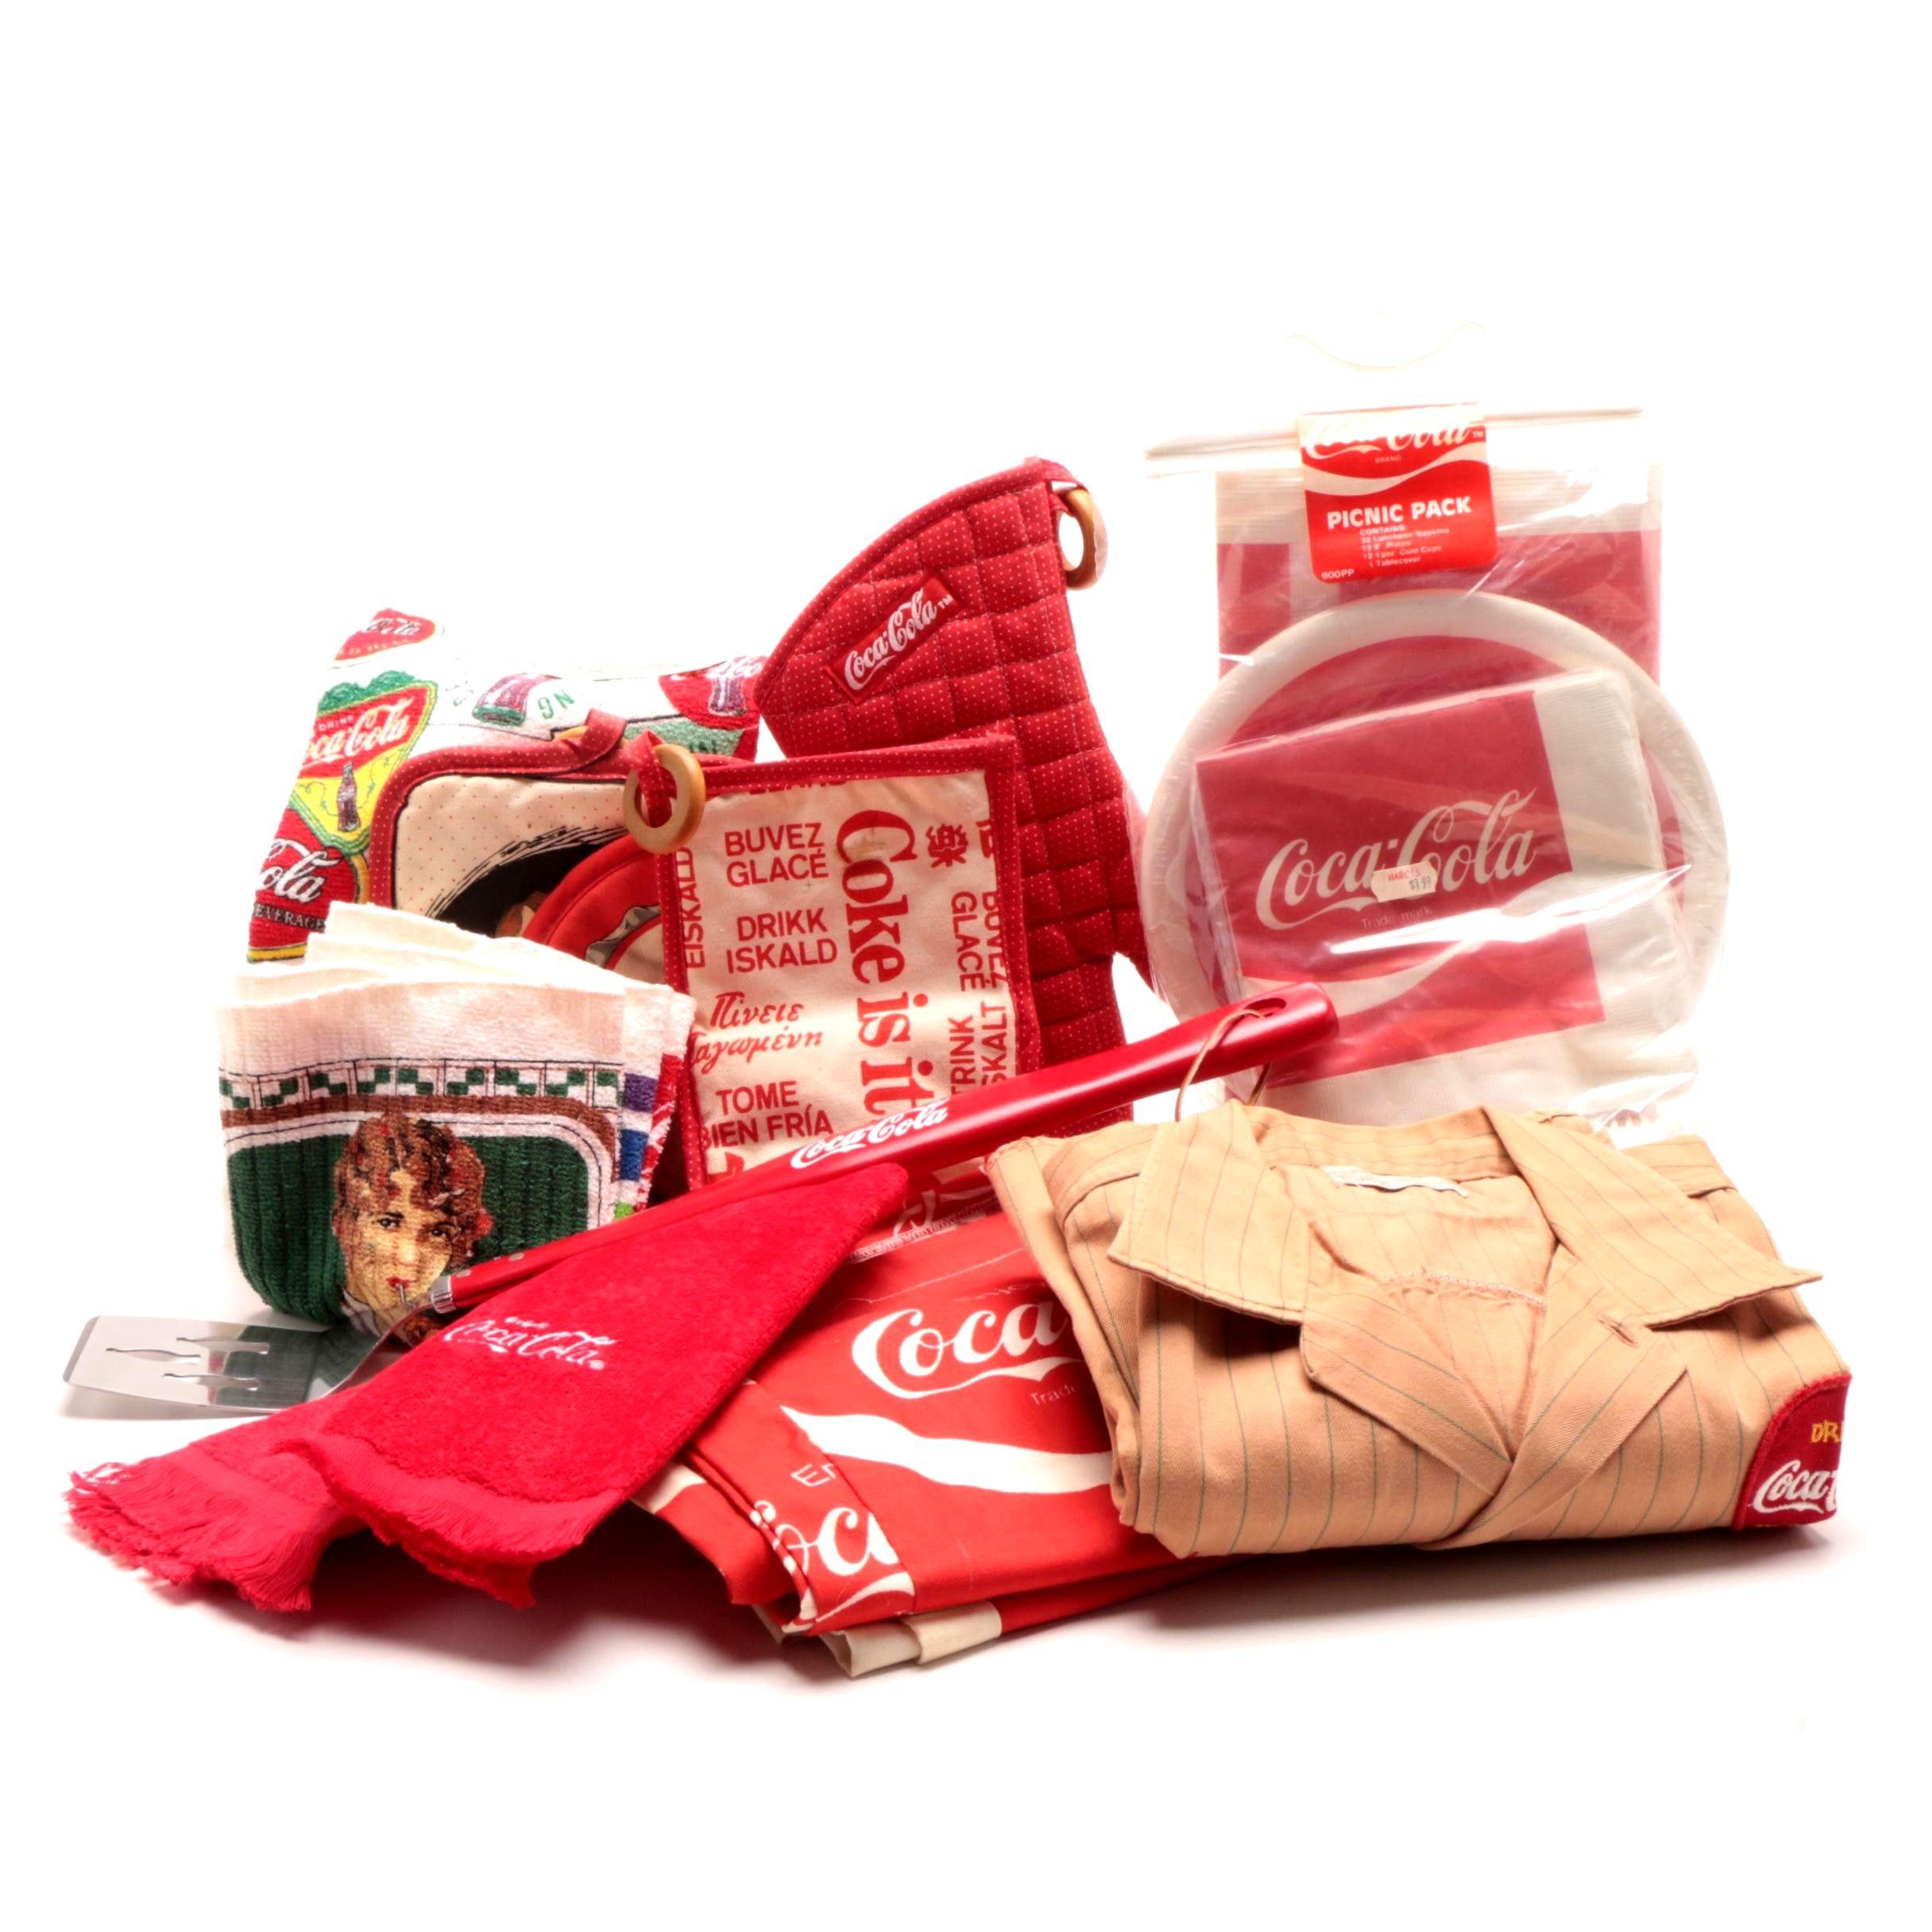 Coca-Cola Clothing and Memorabilia